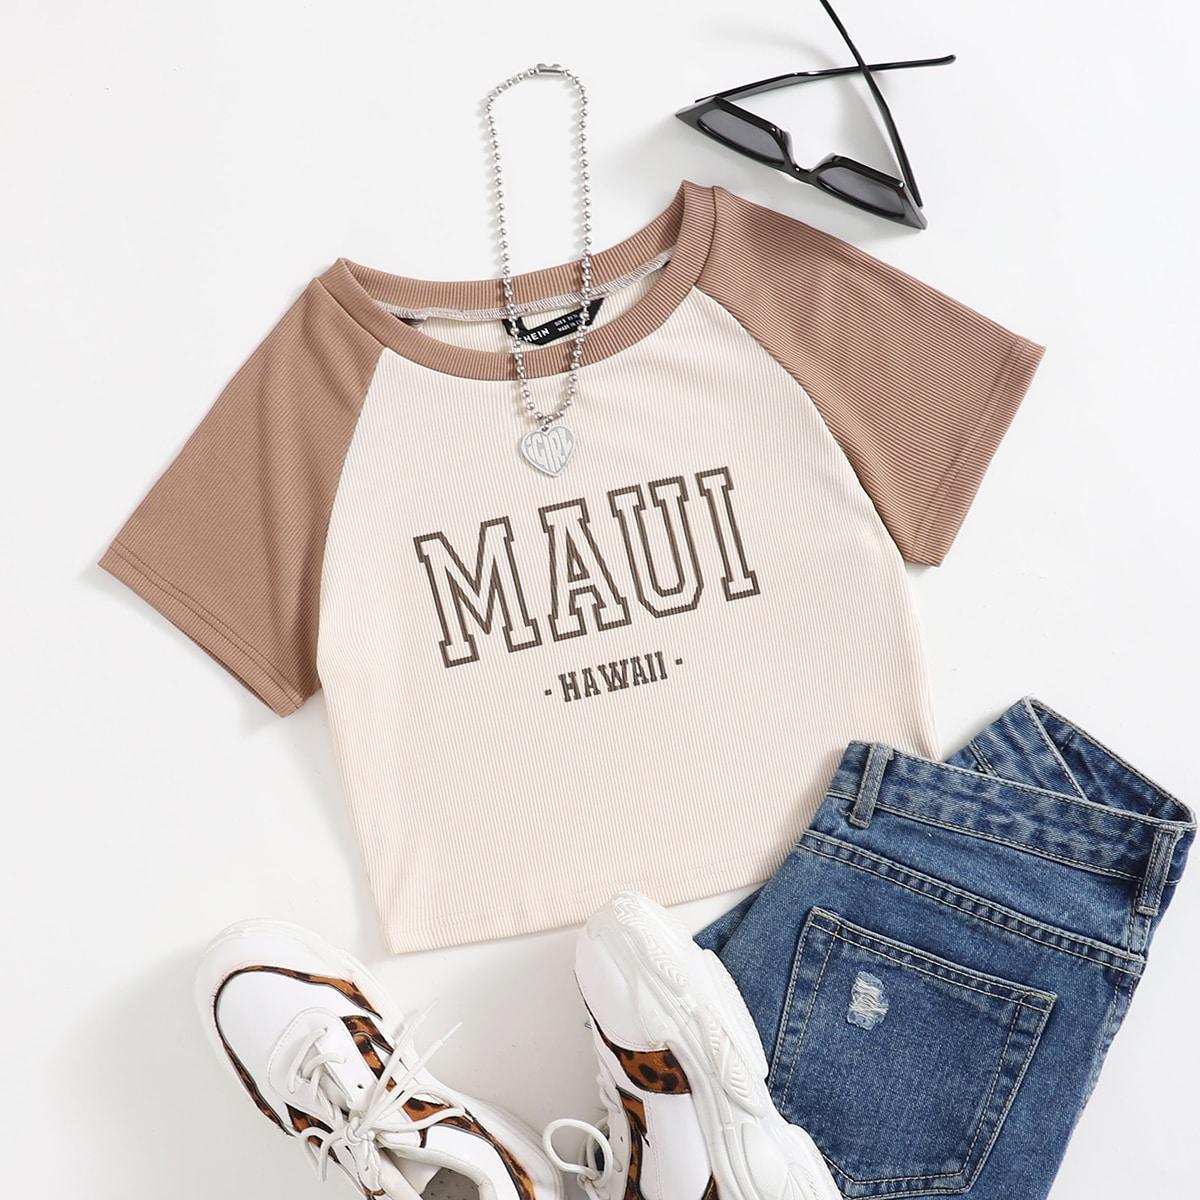 Casual Tekst T-shirt Geplisseerde